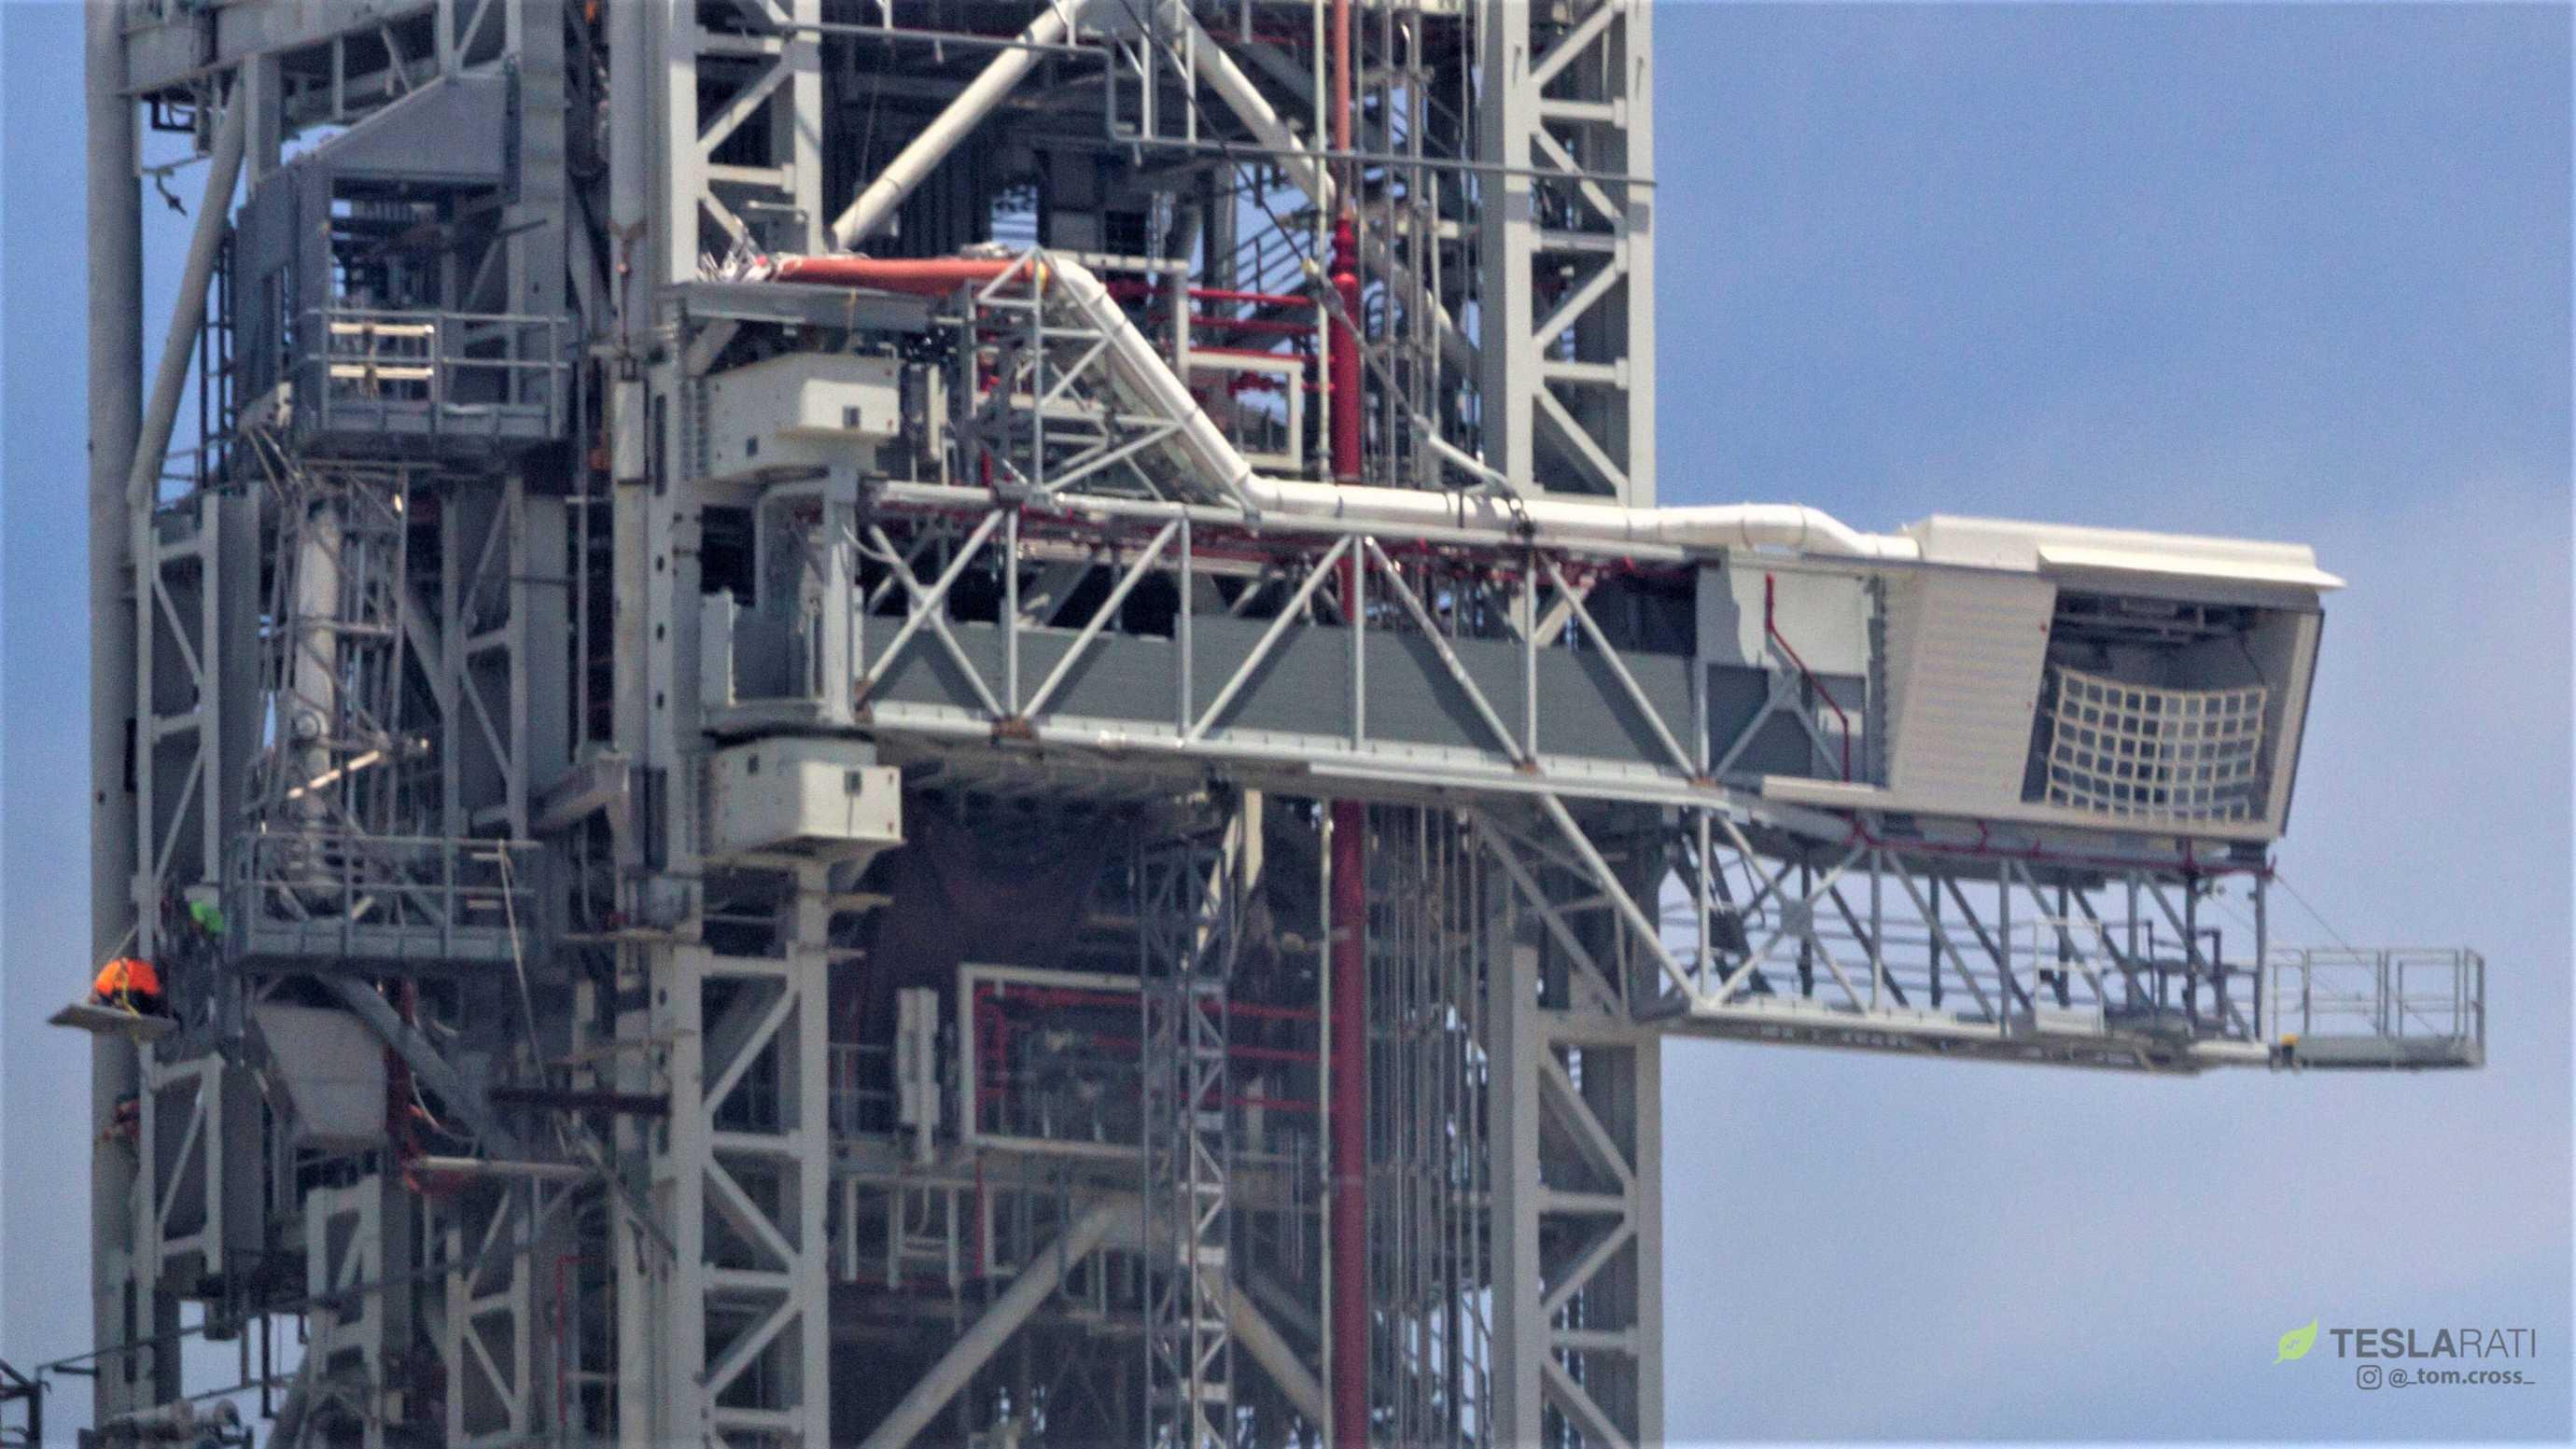 Space Shuttle access arm (Tom Cross) 1